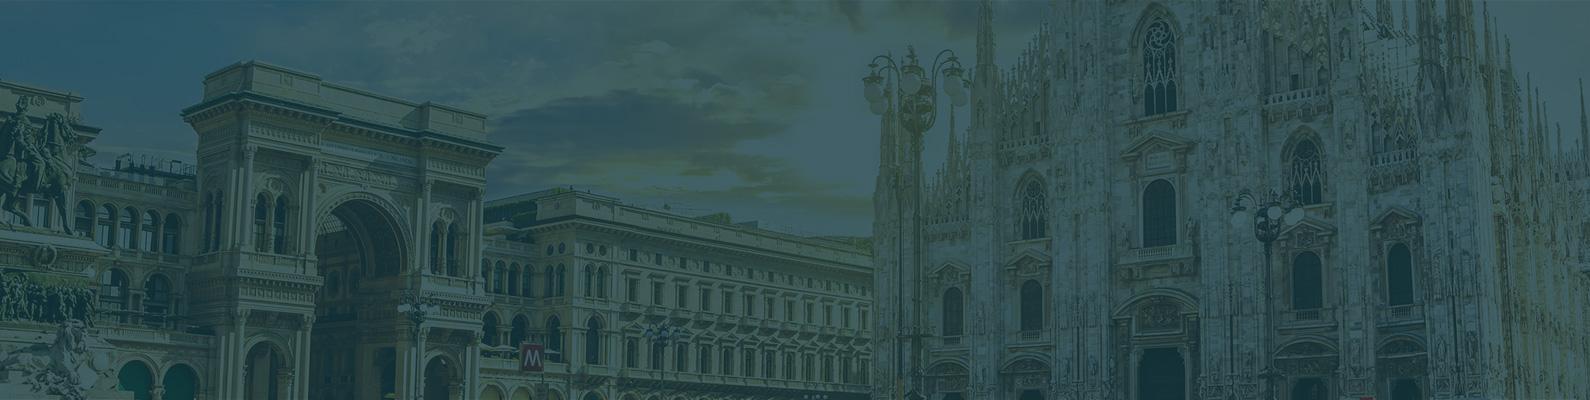 Milan - Gerry's DMC - B2B TRAVEL WHOLESALER Europe, UK, USA and Far East